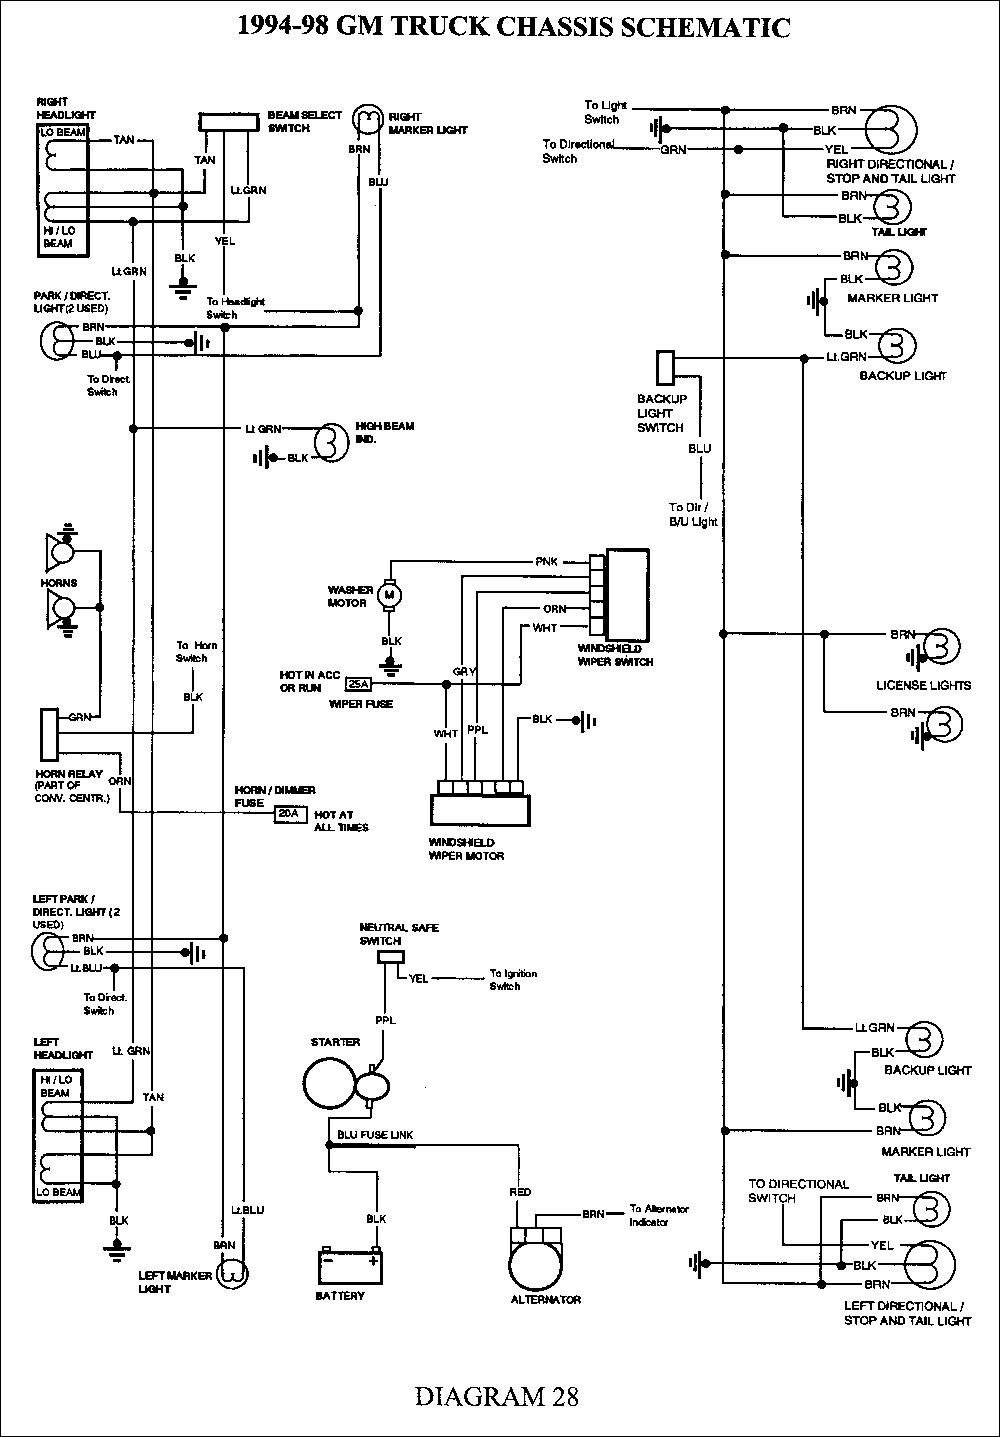 2005 chevy express tail light wiring diagram viewdulah co silverado trailer  wiring diagram 7 pin trailer